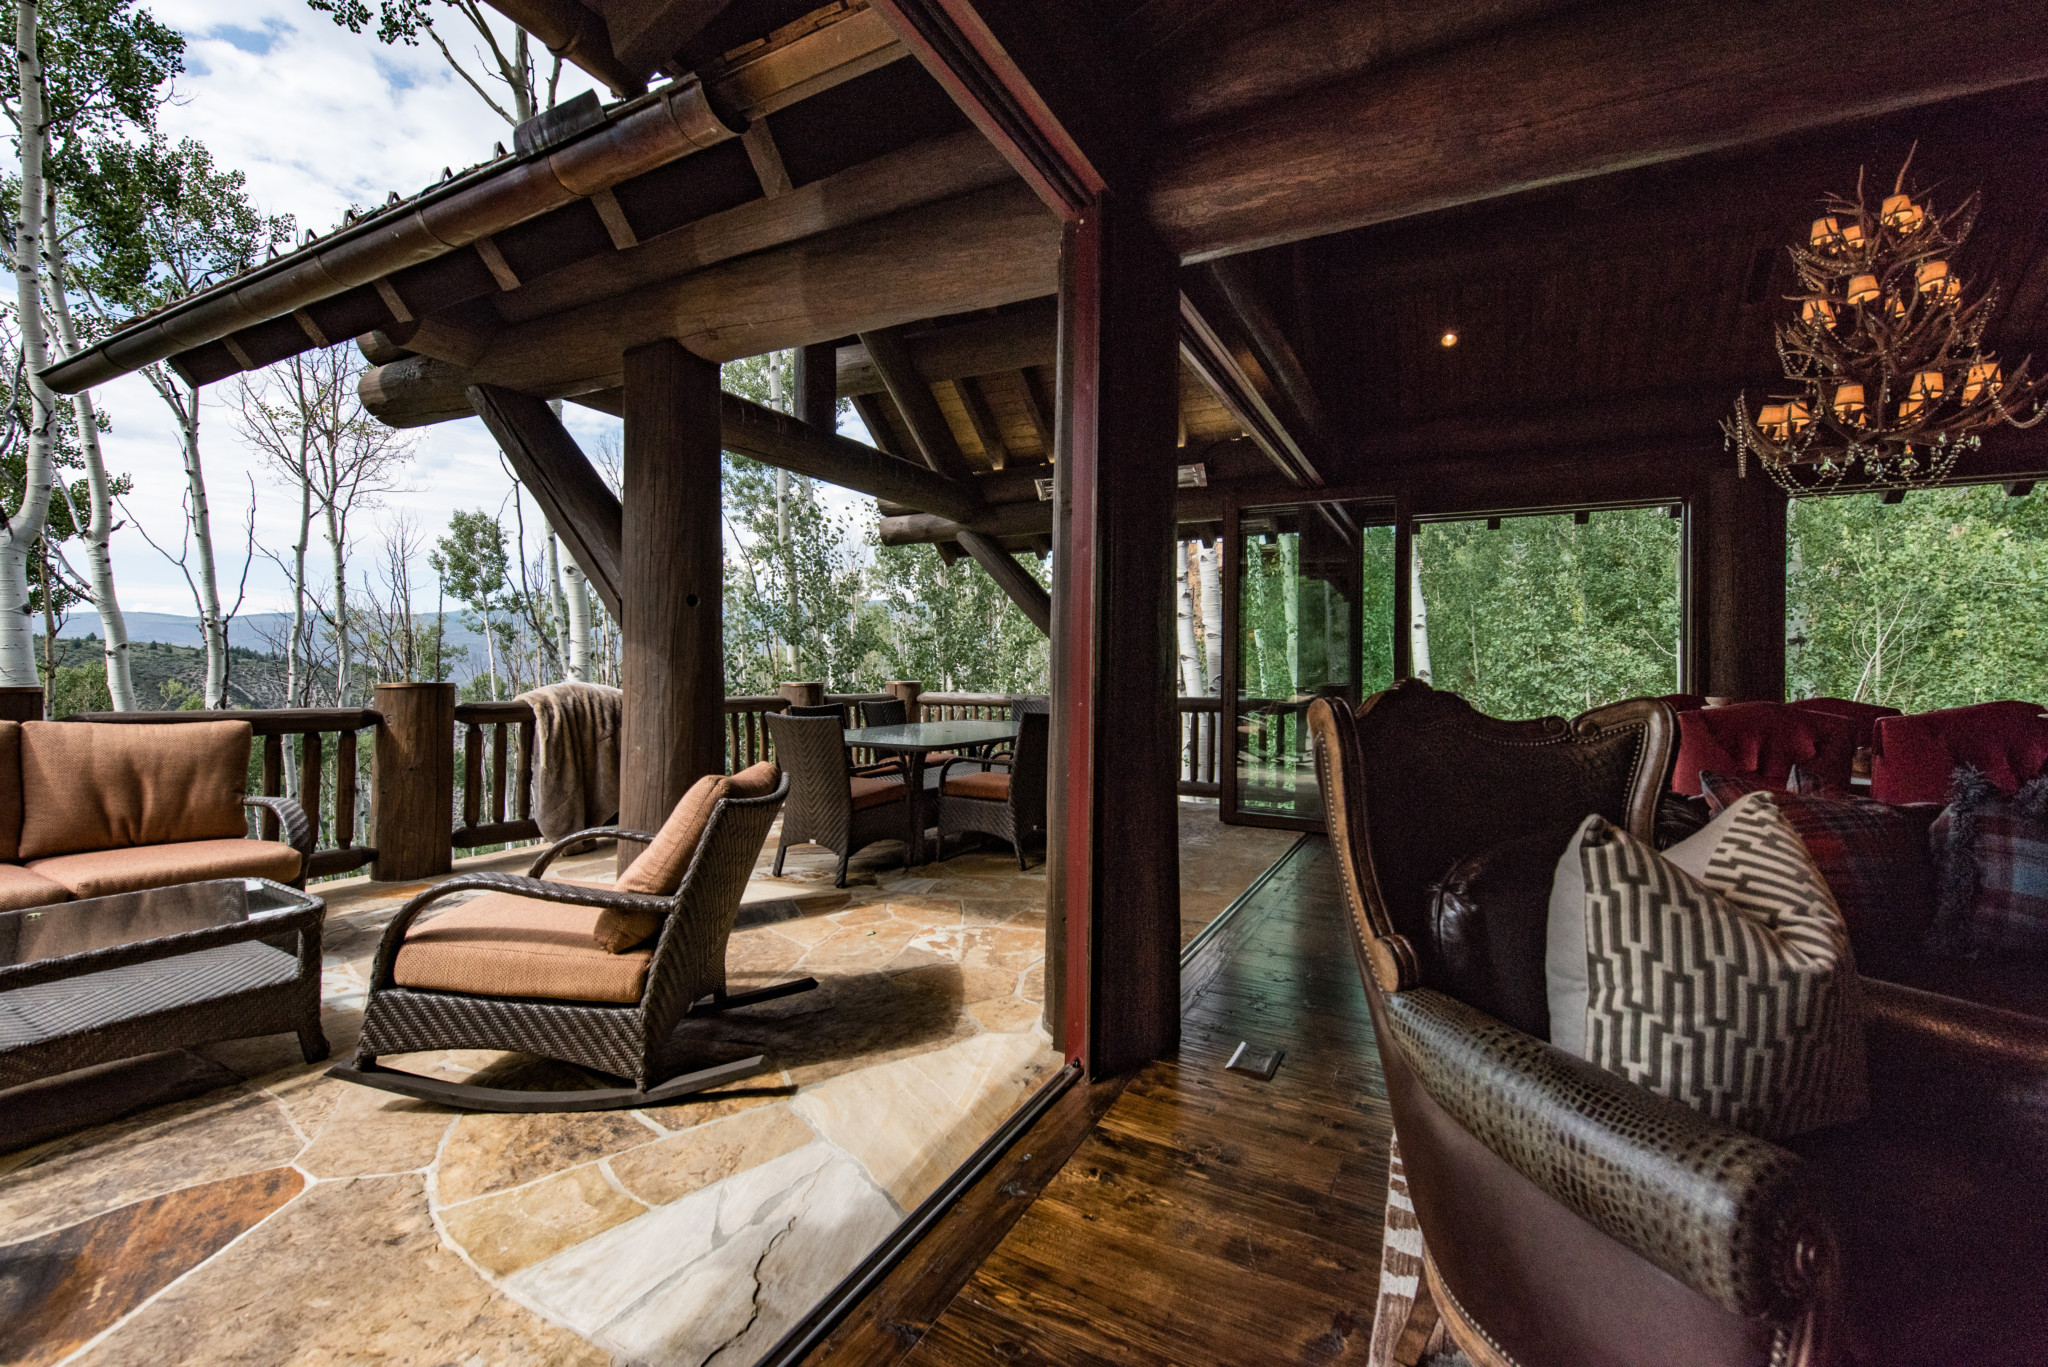 Arrowhead-custom-log-home-interior-exterior-sun-room